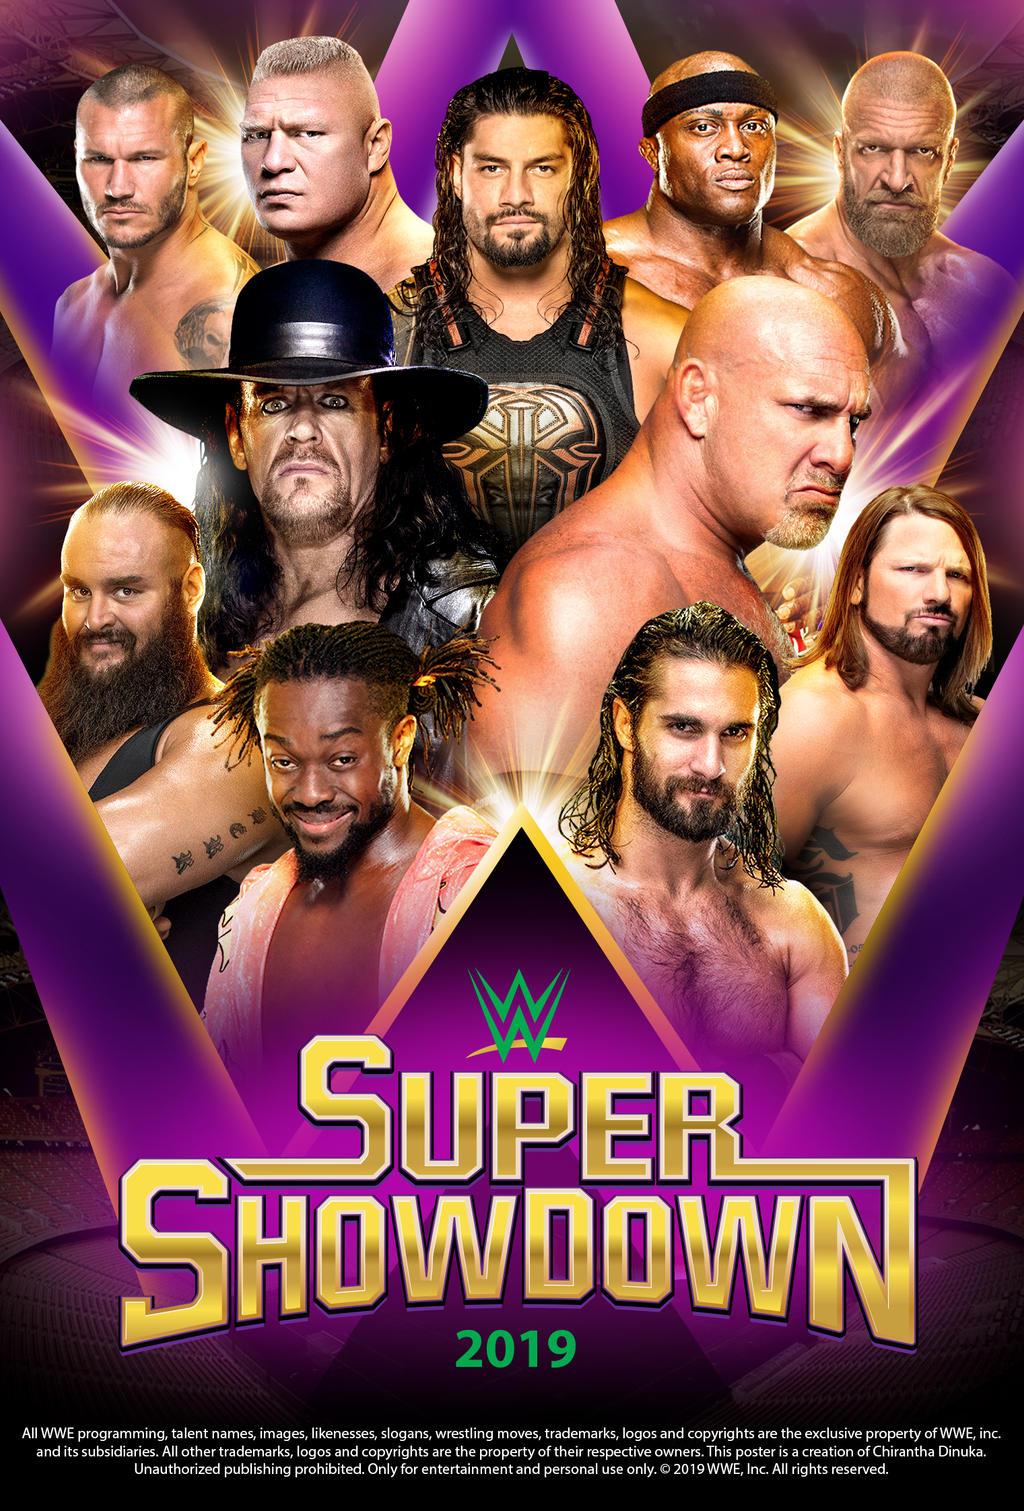 Cartel de WWE Super ShowDown 2019 por Chirantha